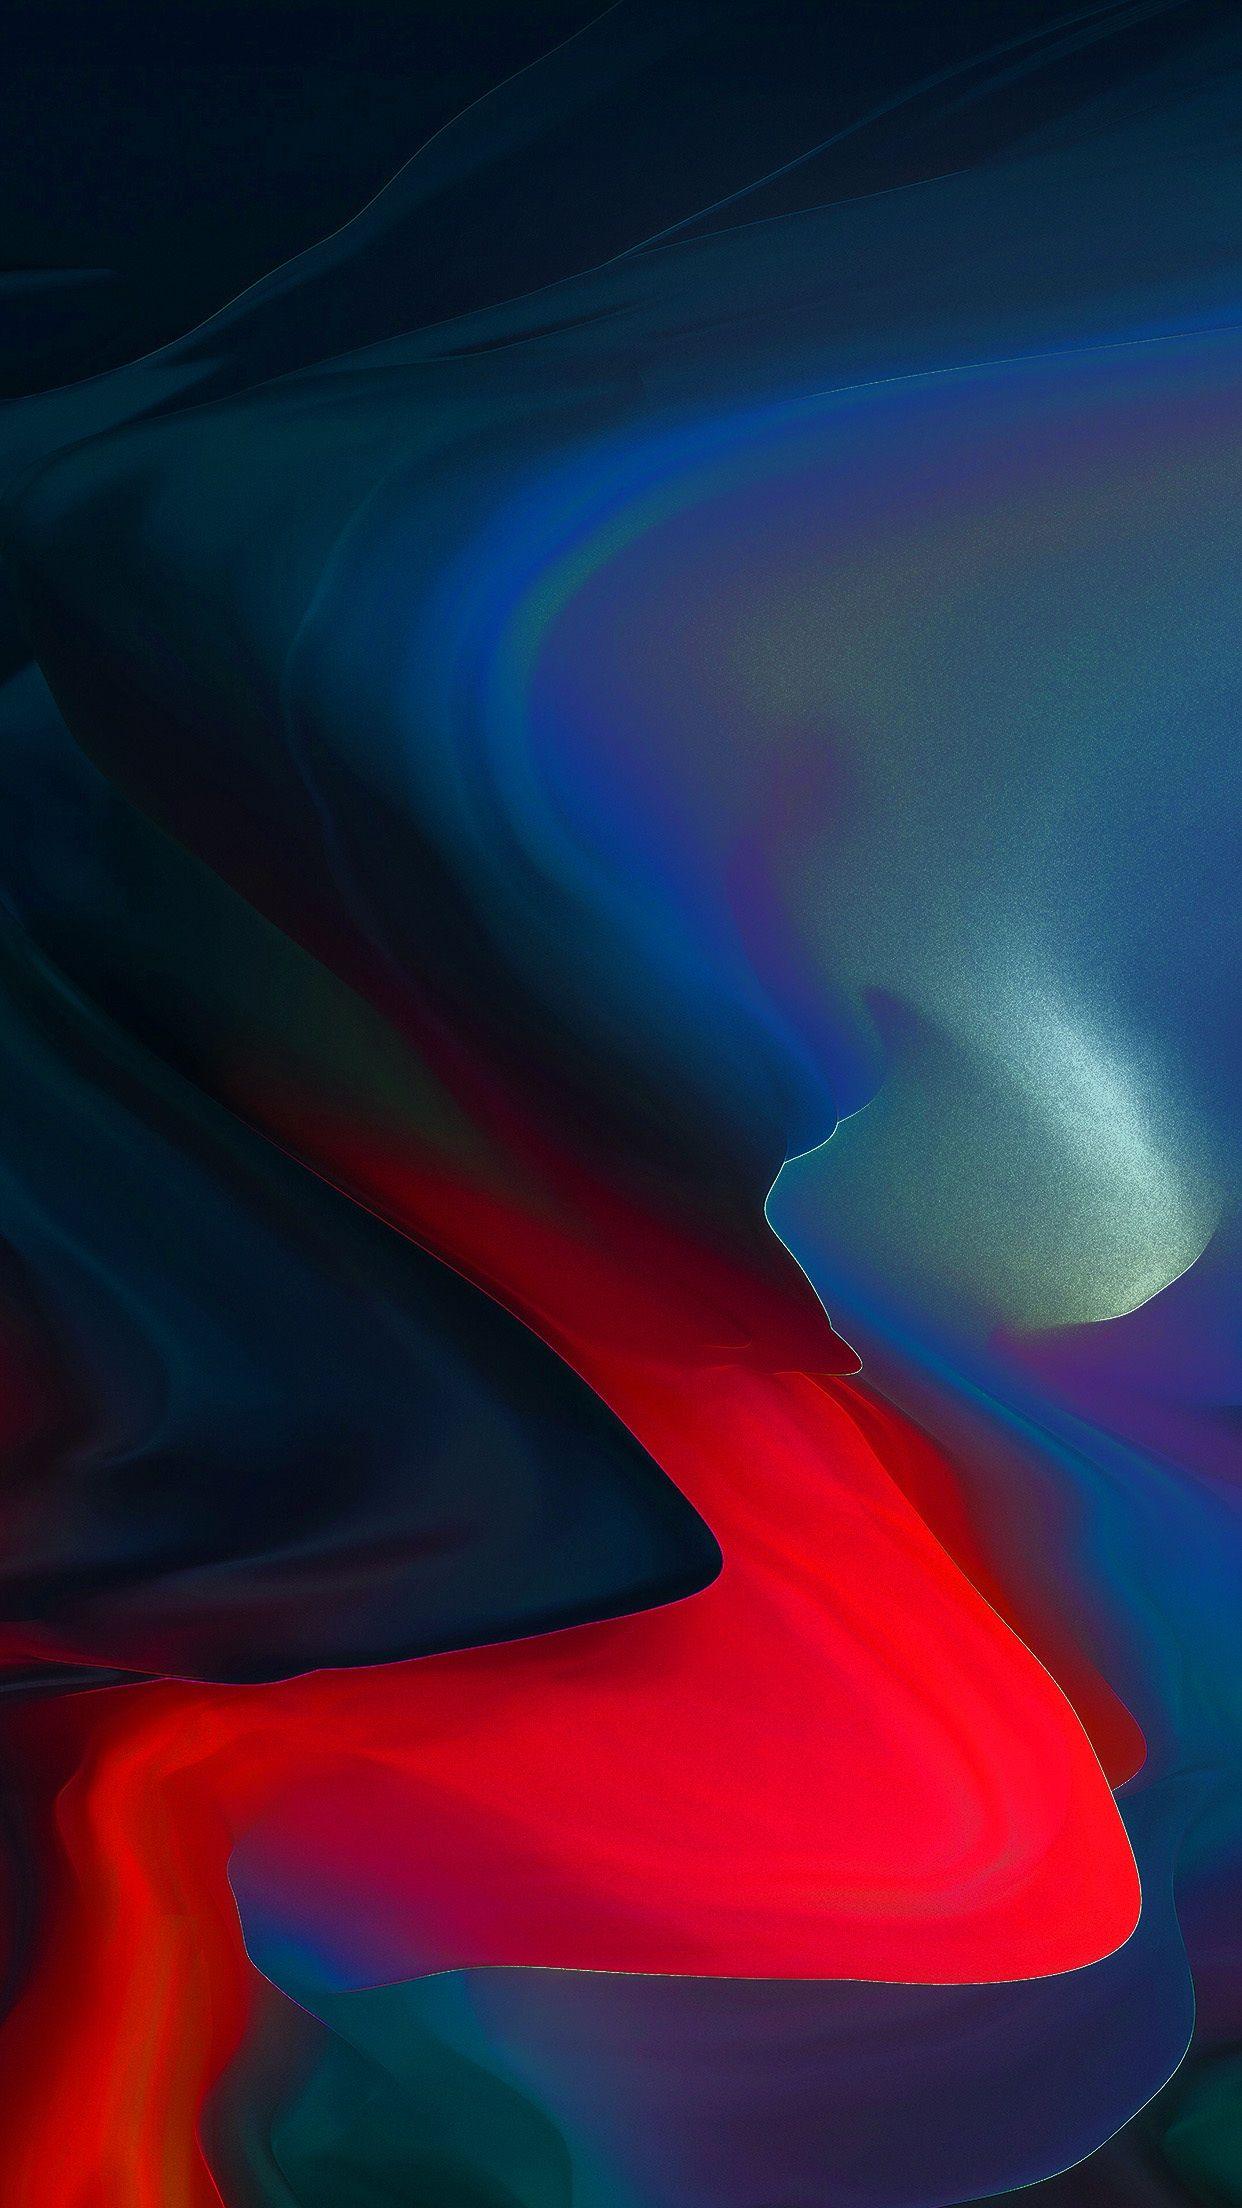 Abstract Iphone Wallpaper Abstract Wallpaper Backgrounds 4k Wallpaper For Mobile Abstract Iphone Wallpaper